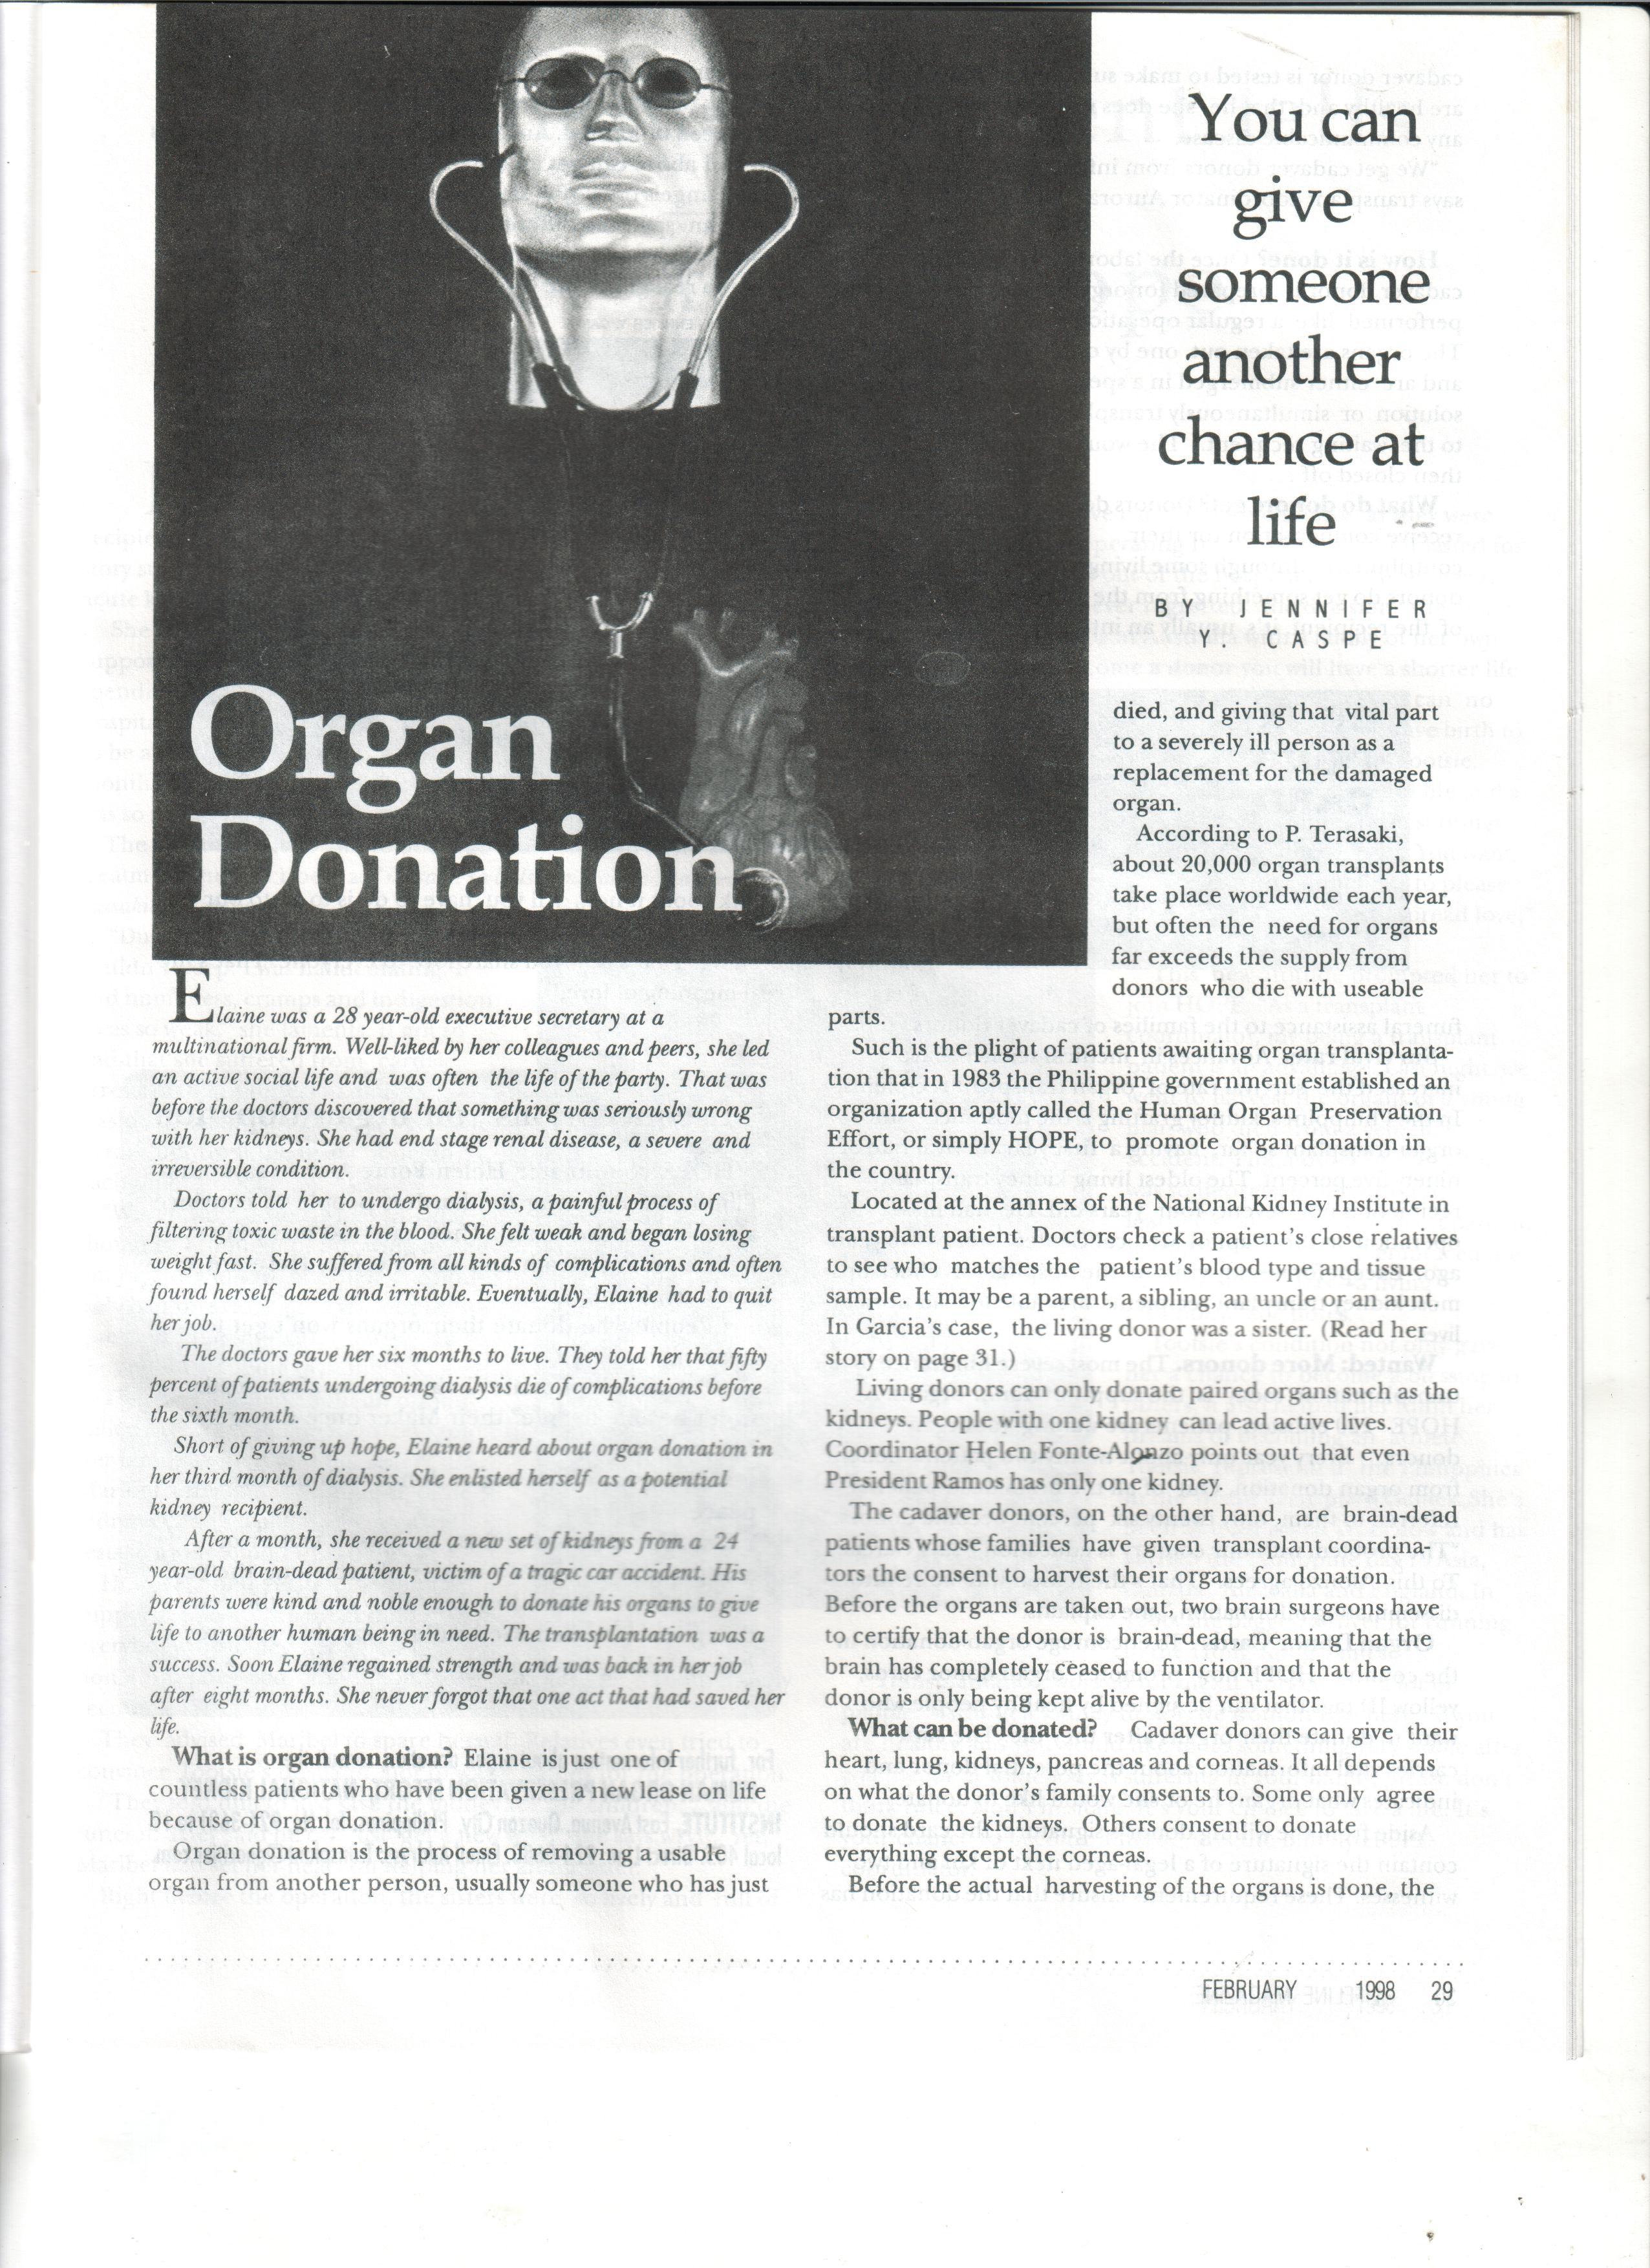 02-98 Organ Donation 1